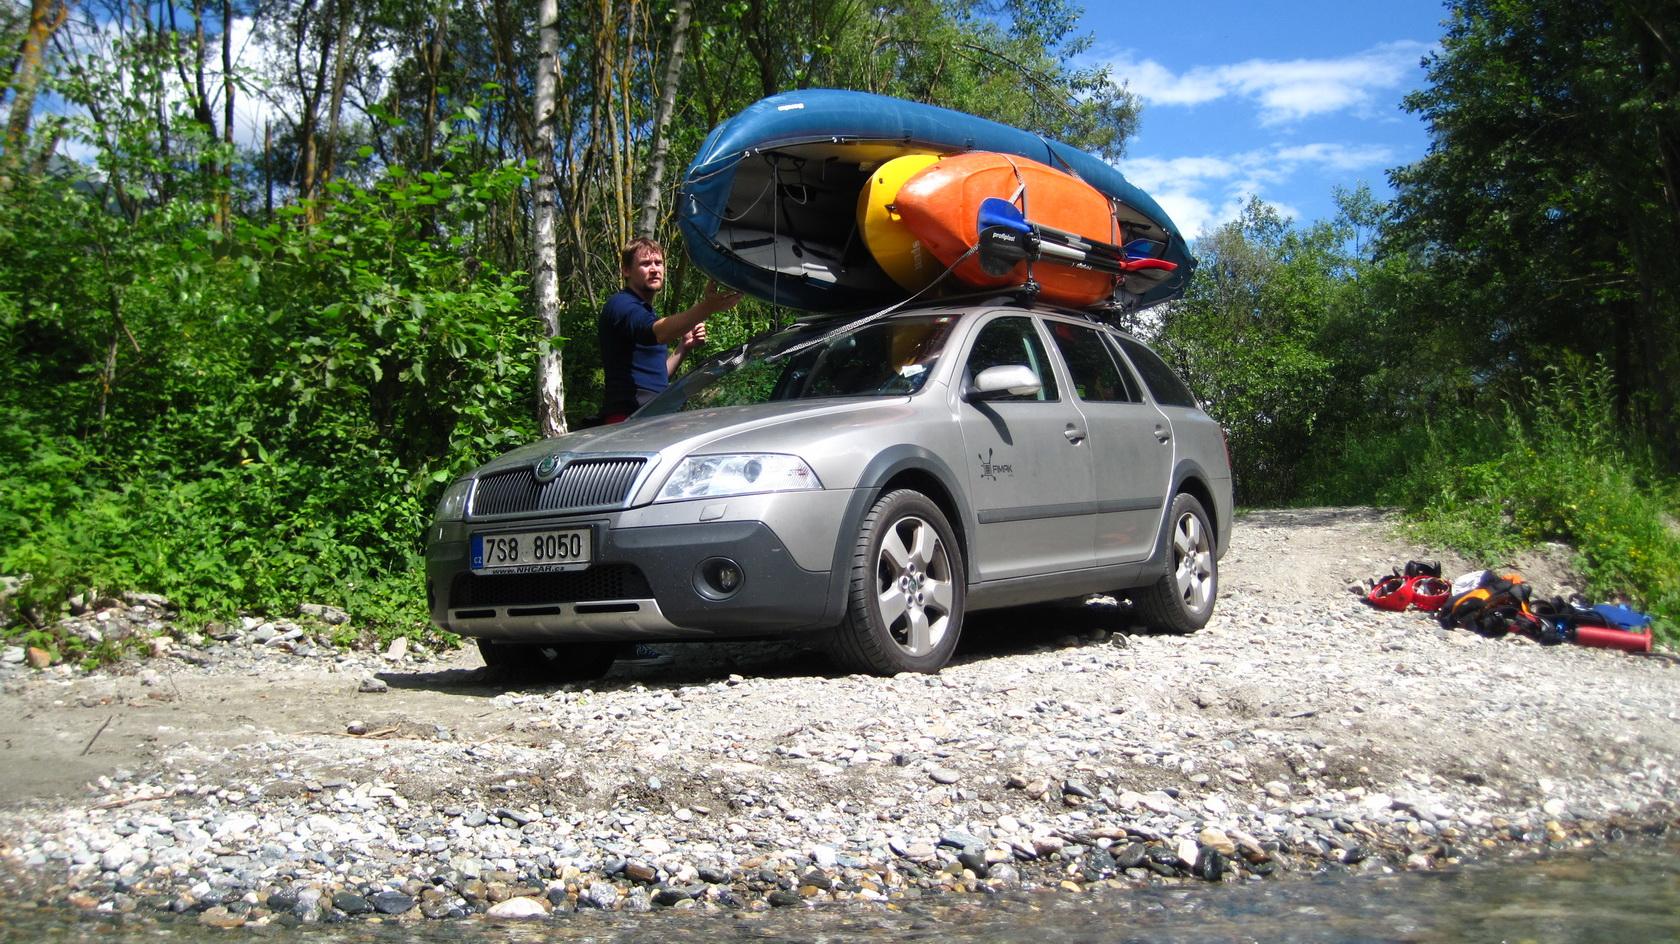 skoda-octavia-kayak-river.JPG